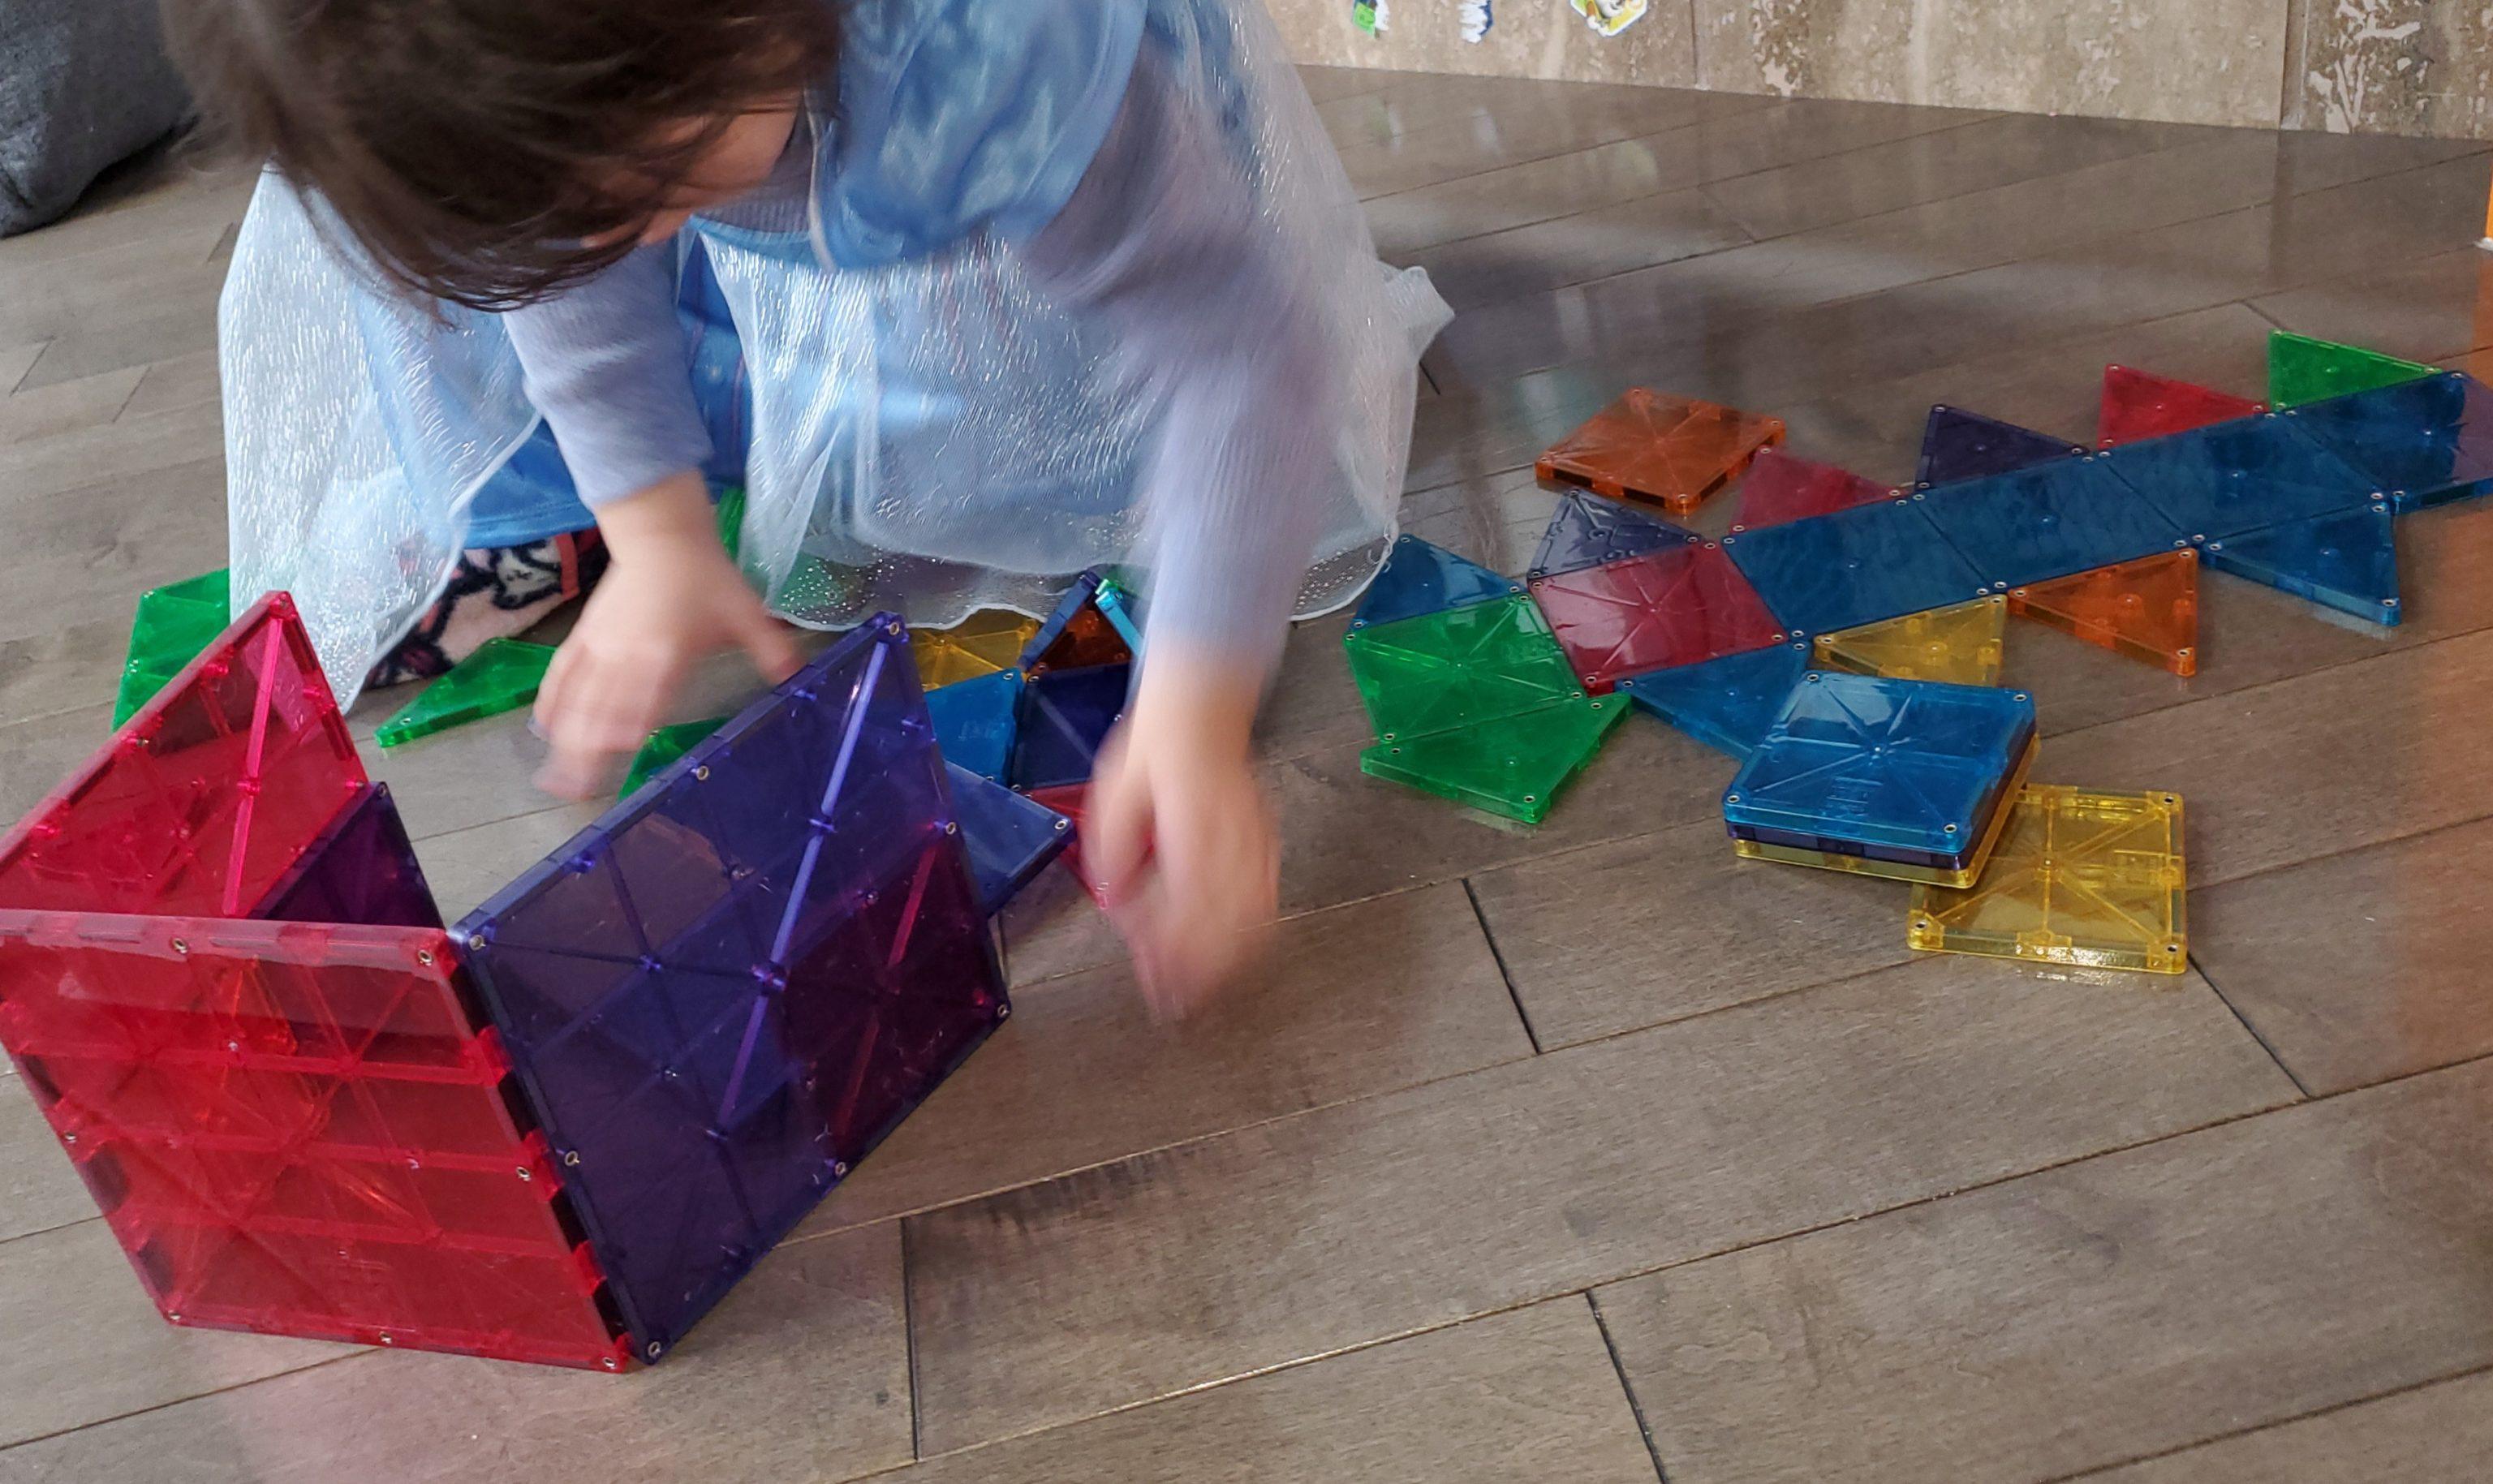 Sanity Savers: Member Blog - How to Replicate Explore & More at Home